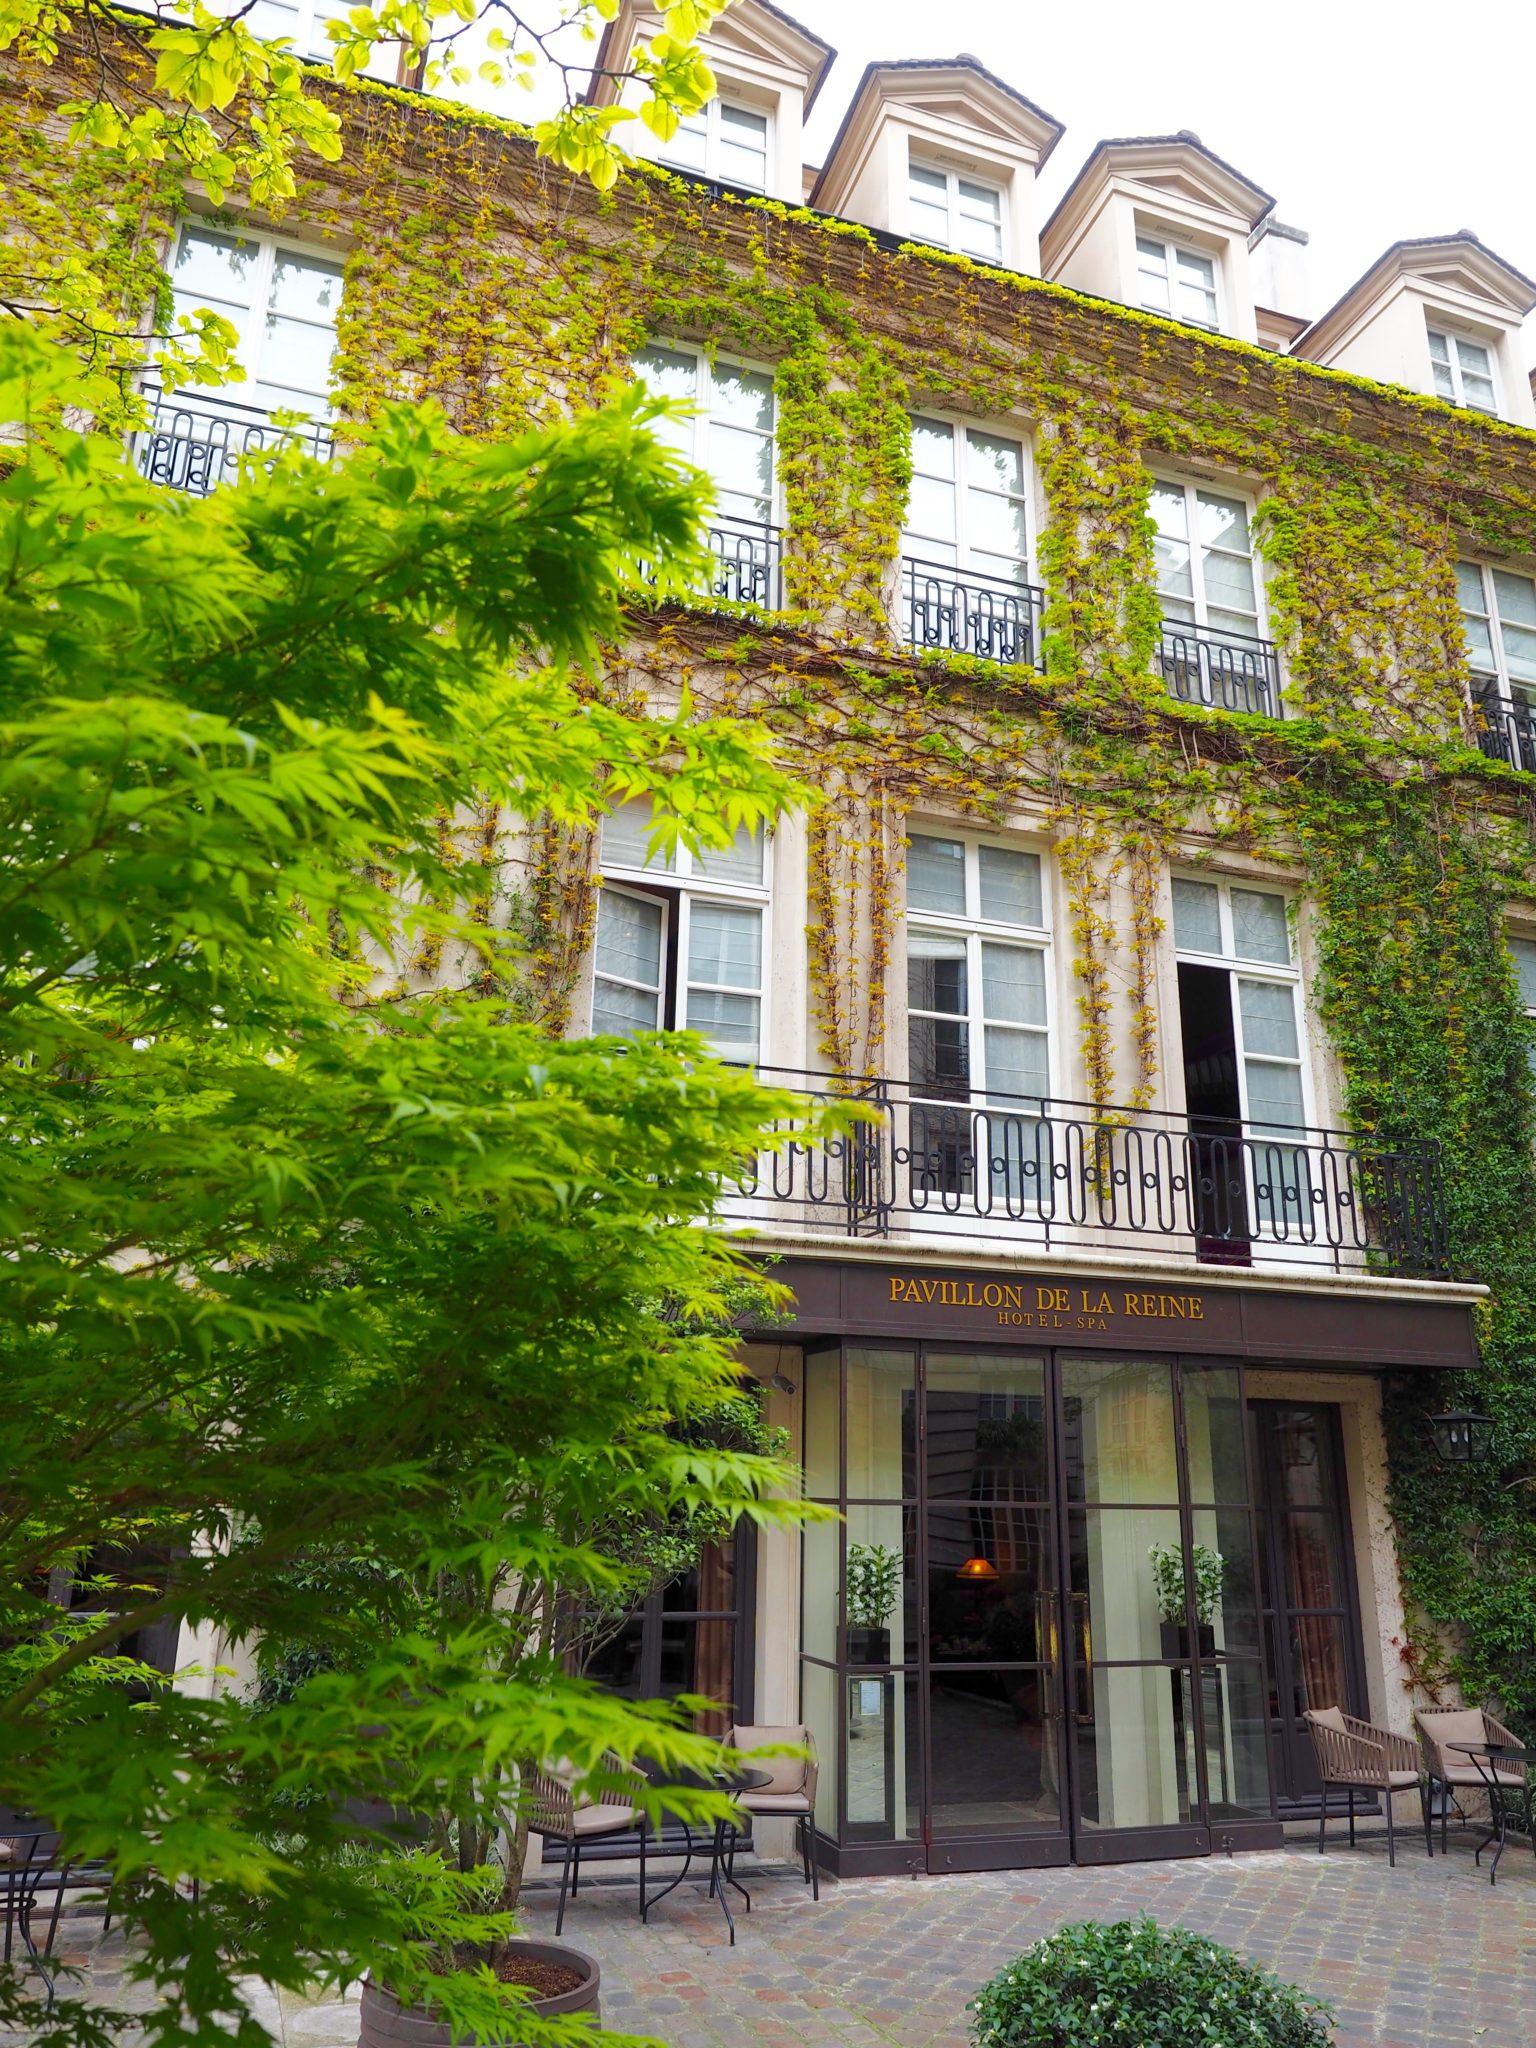 Hotel-Pavillon-de-la-reine